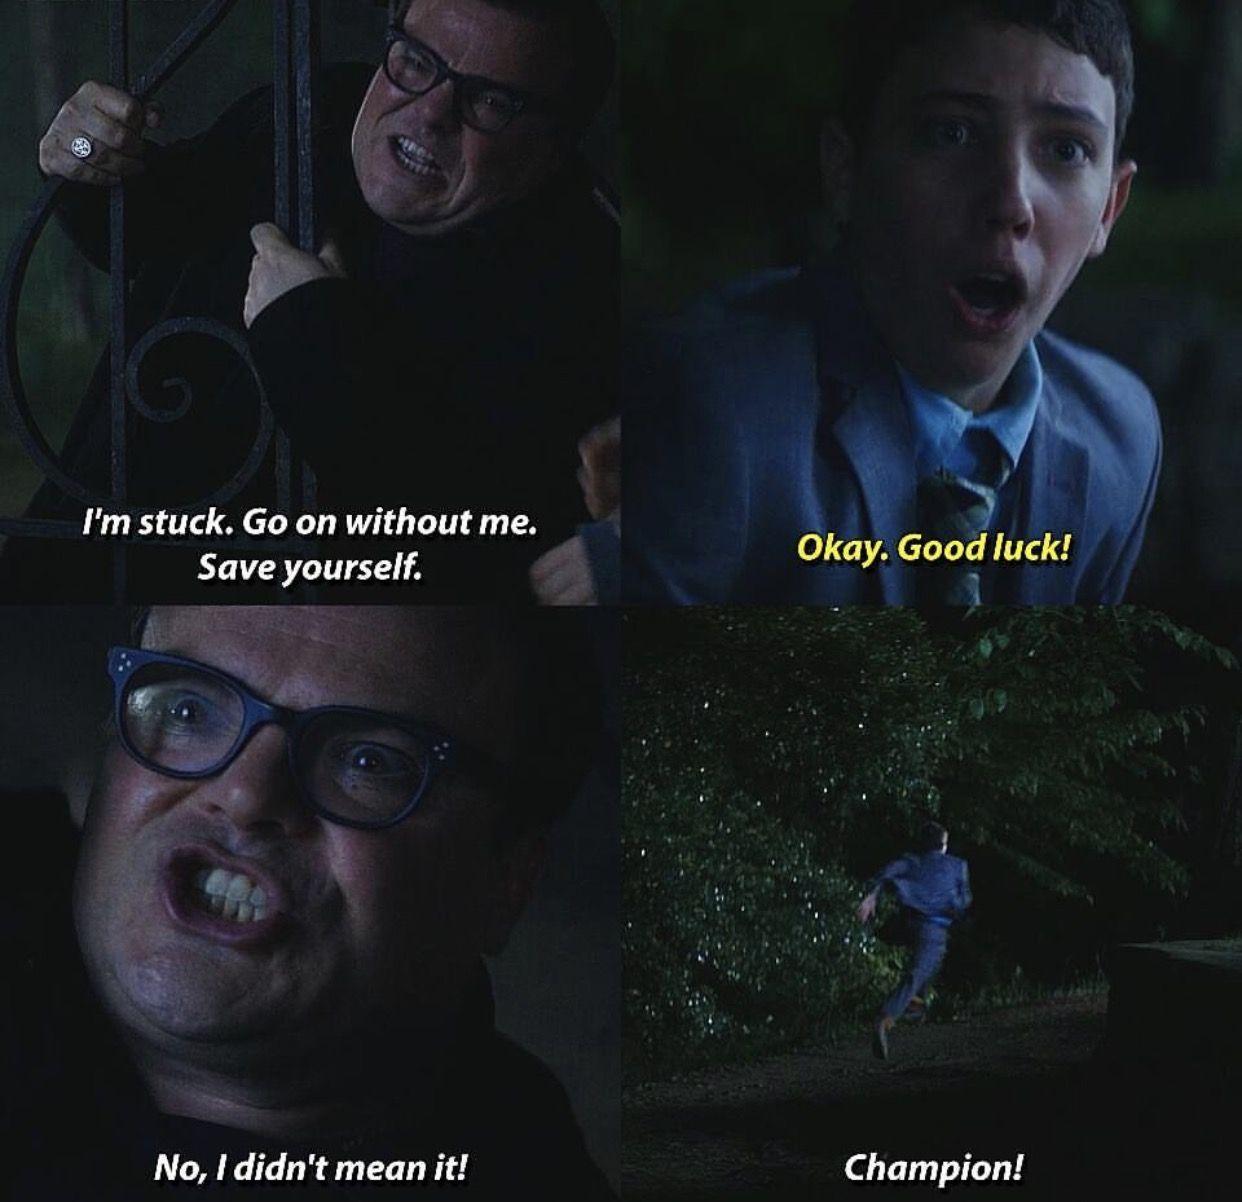 """I didn't mean it! CHAMPION!"" Goosebumps, Goosebumps"